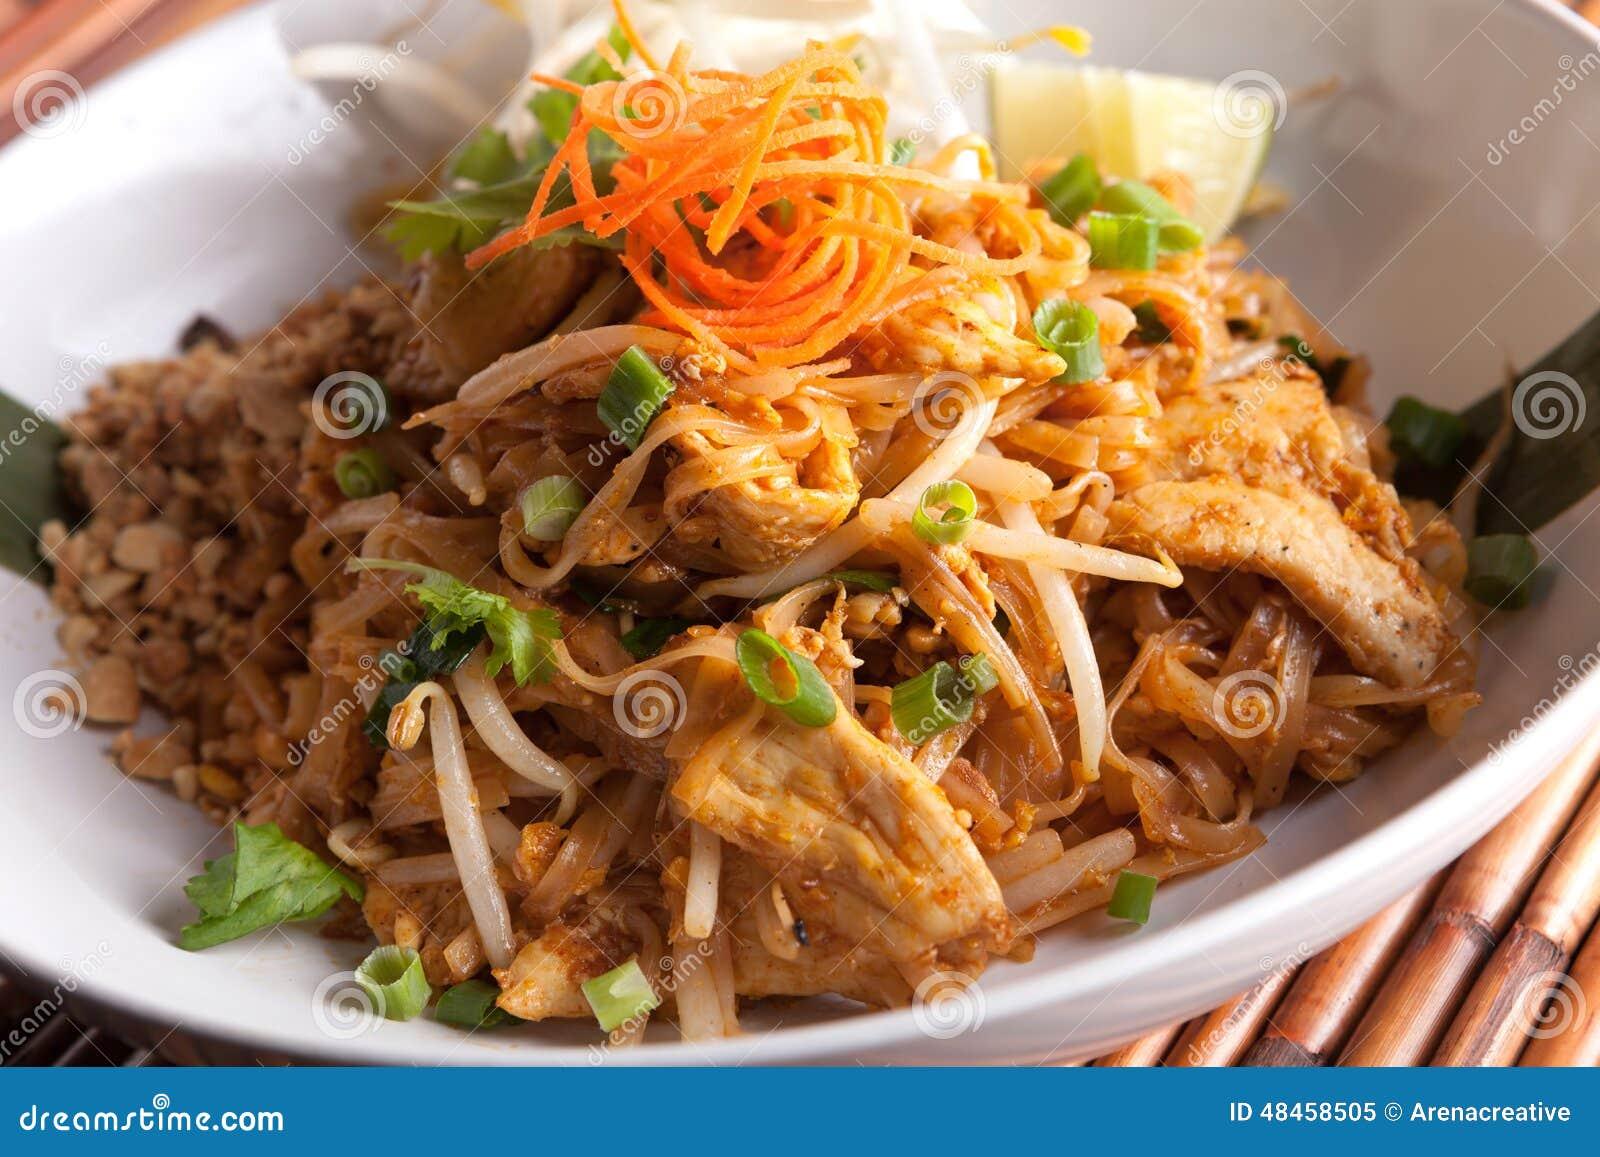 how to make an intense thai chicken stock